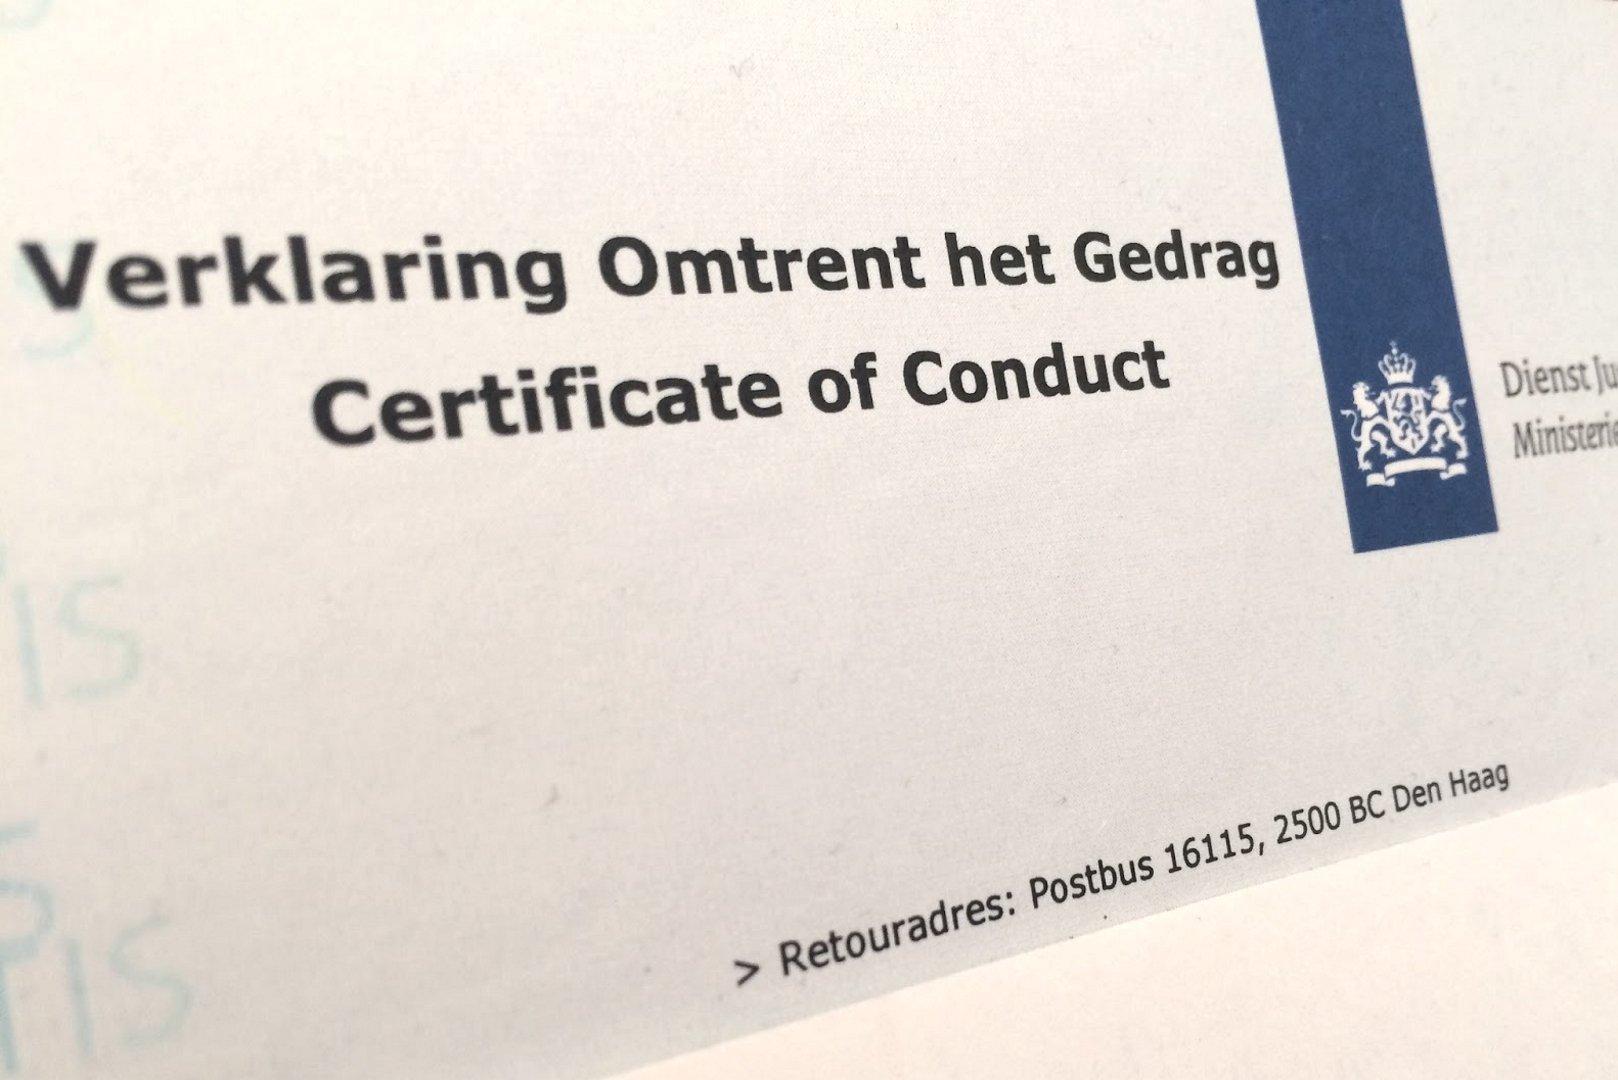 Verklaring omtrent gedrag (VOG) | Gemeente Súdwest-Fryslân